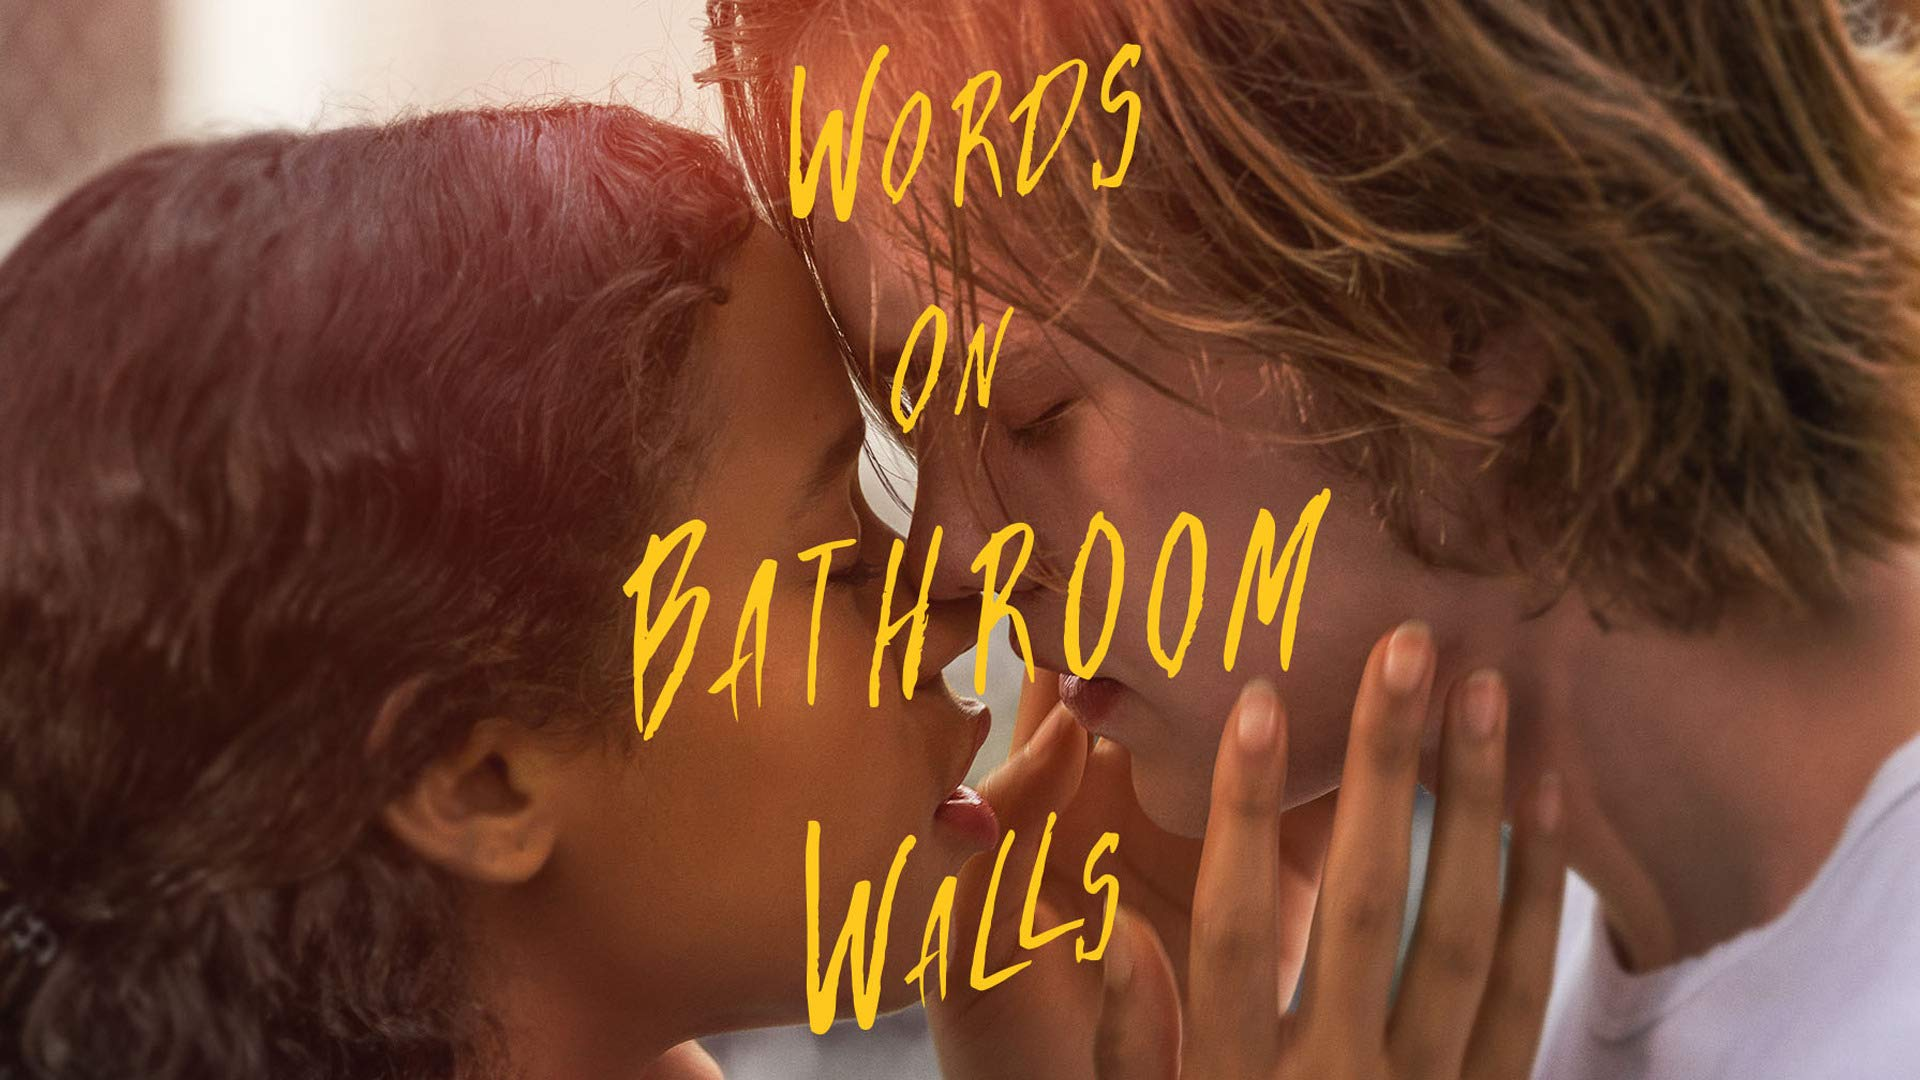 Watch Words On Bathroom Walls Prime Video